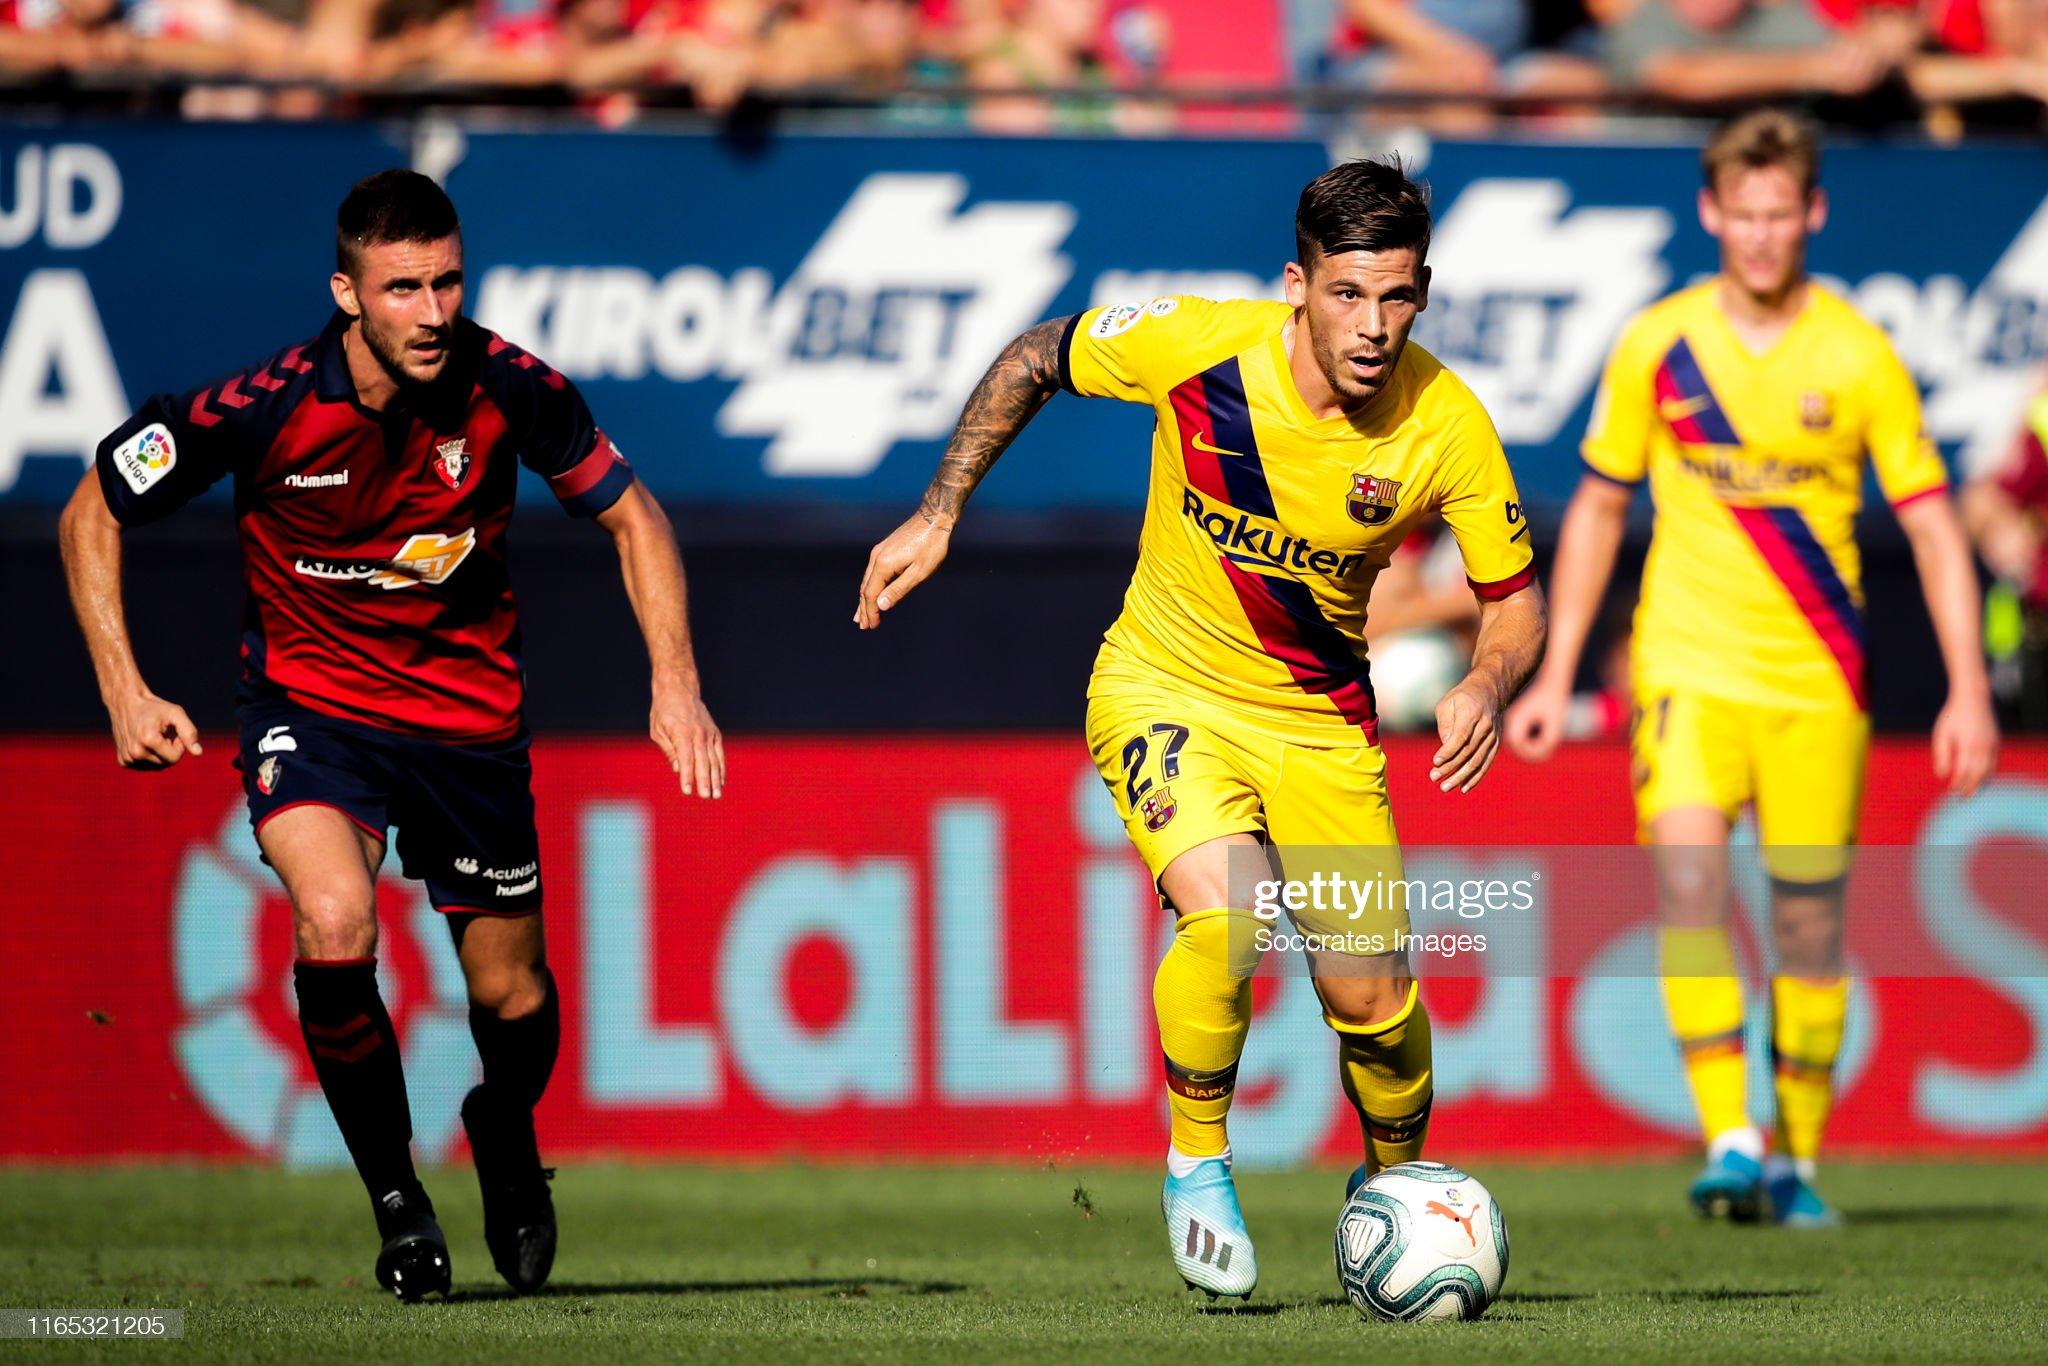 صور مباراة : أوساسونا - برشلونة 2-2 ( 31-08-2019 )  Carles-perez-of-fc-barcelona-during-the-la-liga-santander-match-v-picture-id1165321205?s=2048x2048